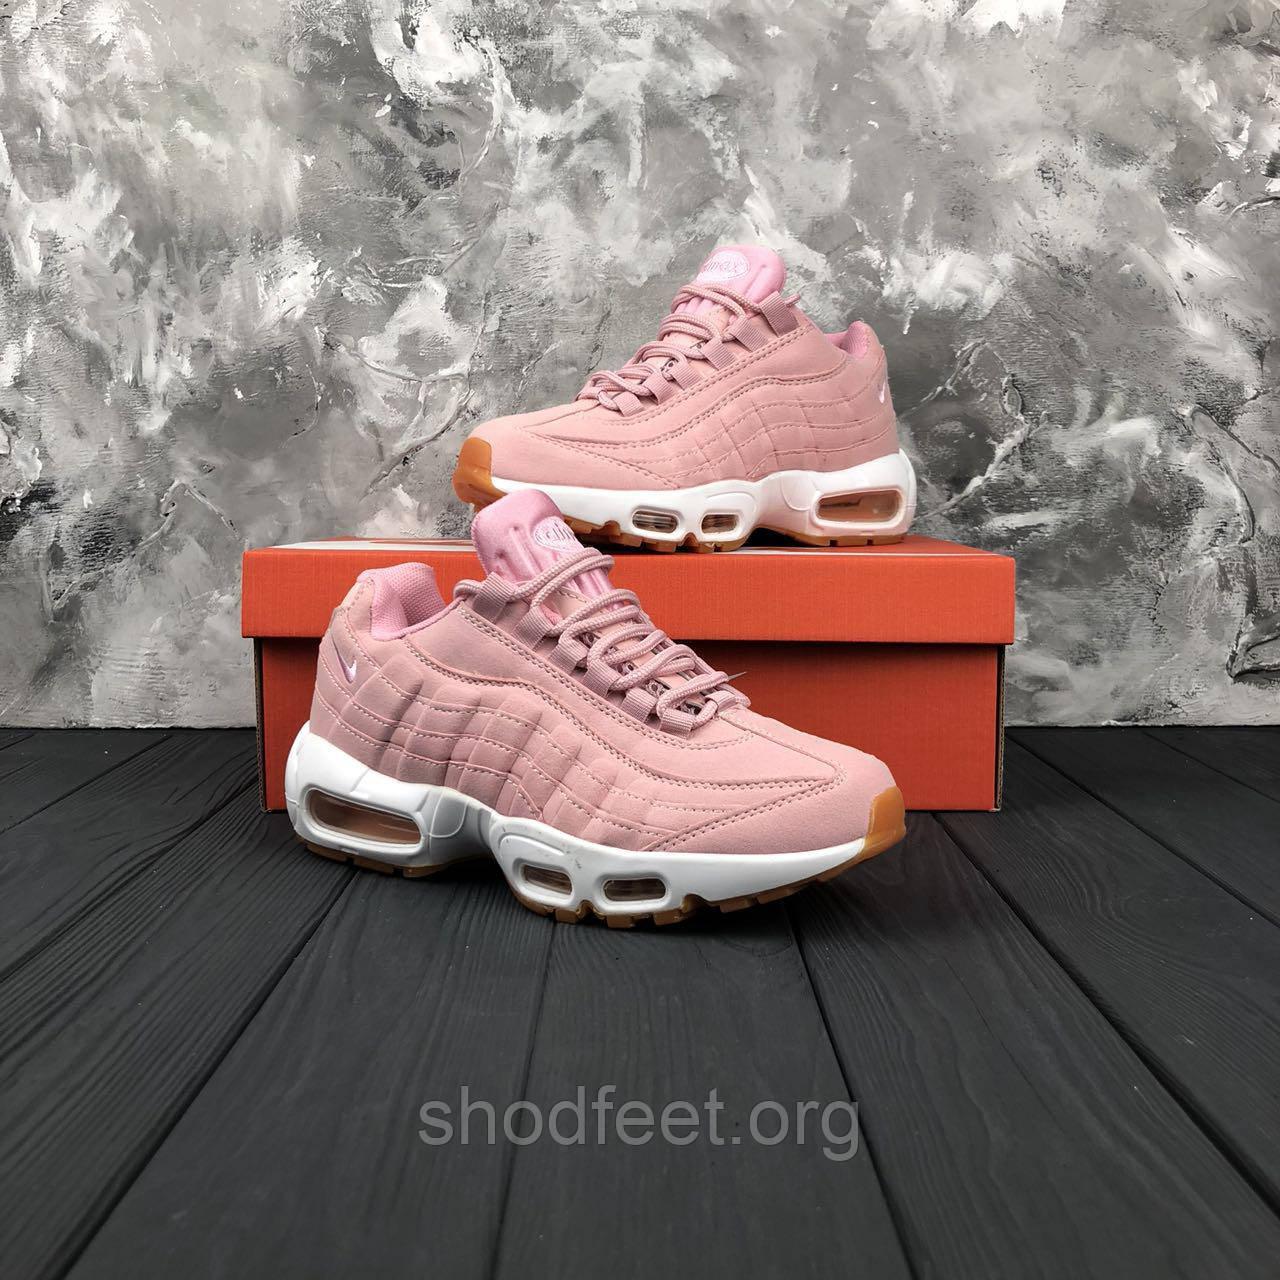 60f4598e Женские кроссовки Nike Air Max 95 Premium Pink Oxford - ShodFeet в Харькове